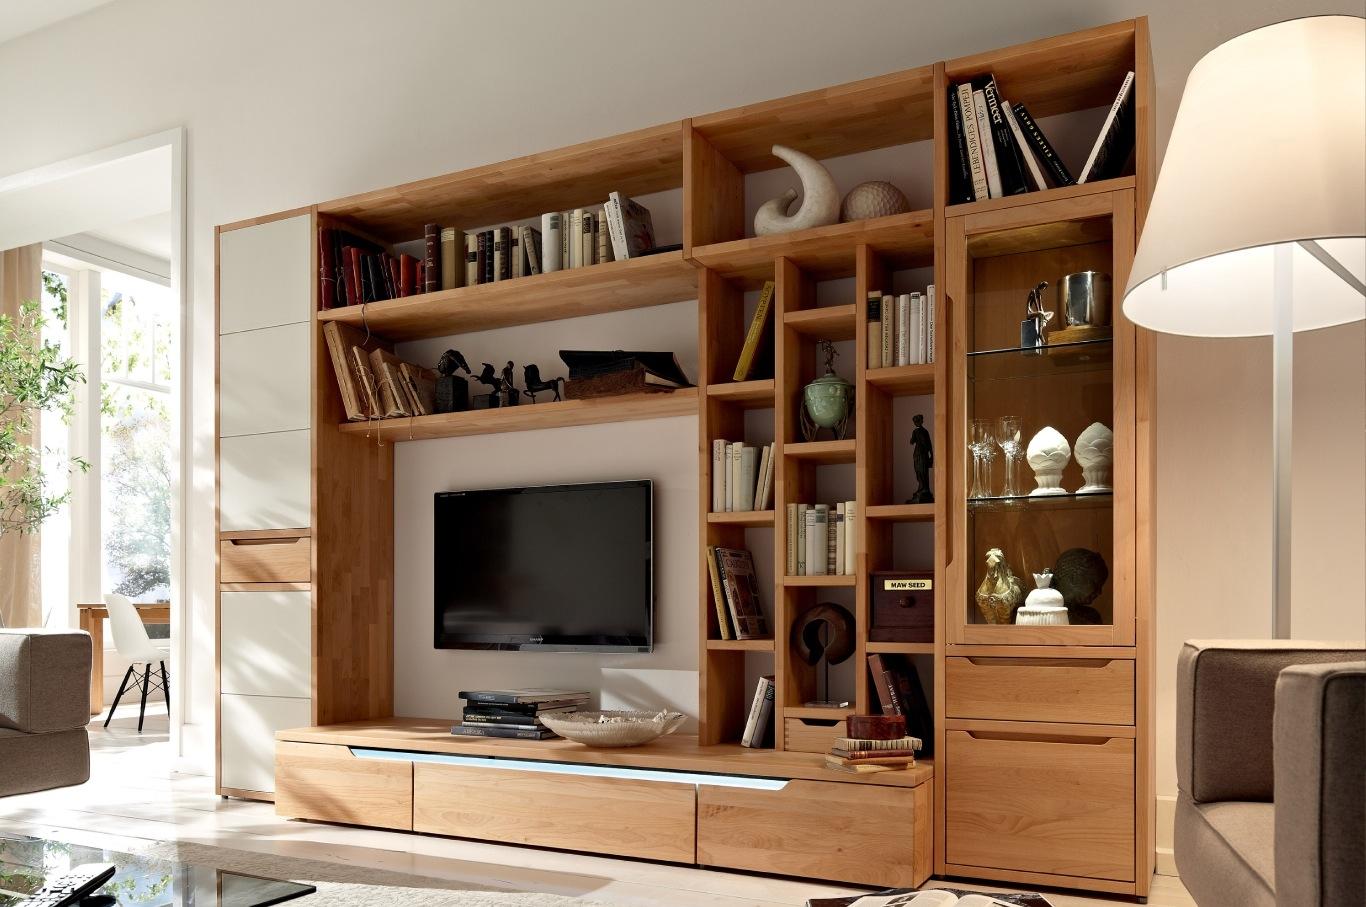 Tv Bookshelves Antevortaco Regarding Bookshelf With Tv Space (#13 of 15)